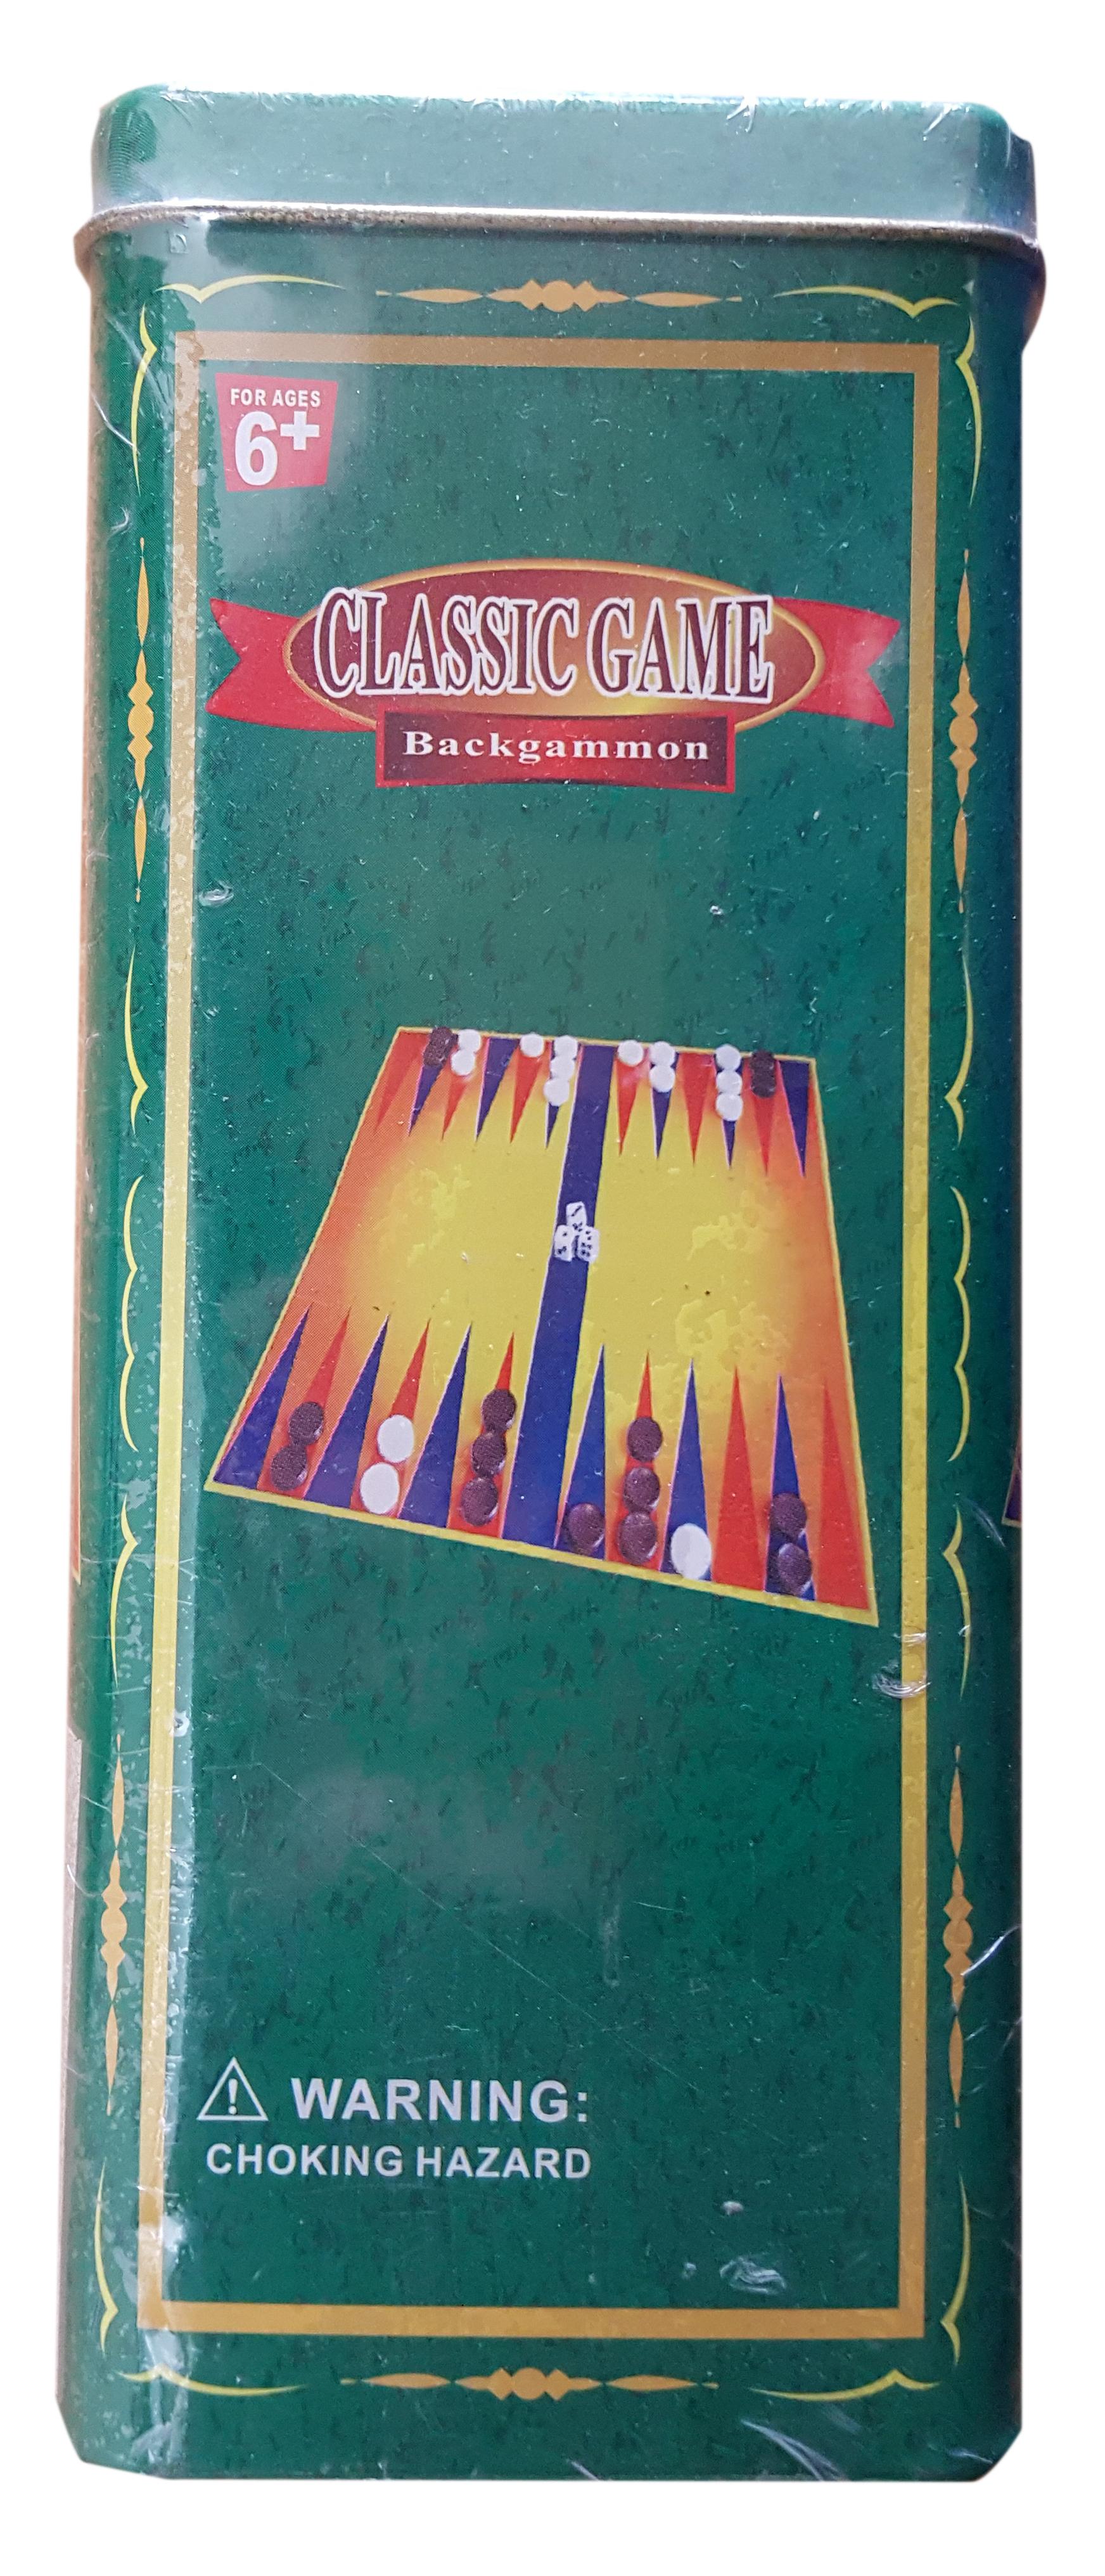 Classic Game. Backgammon